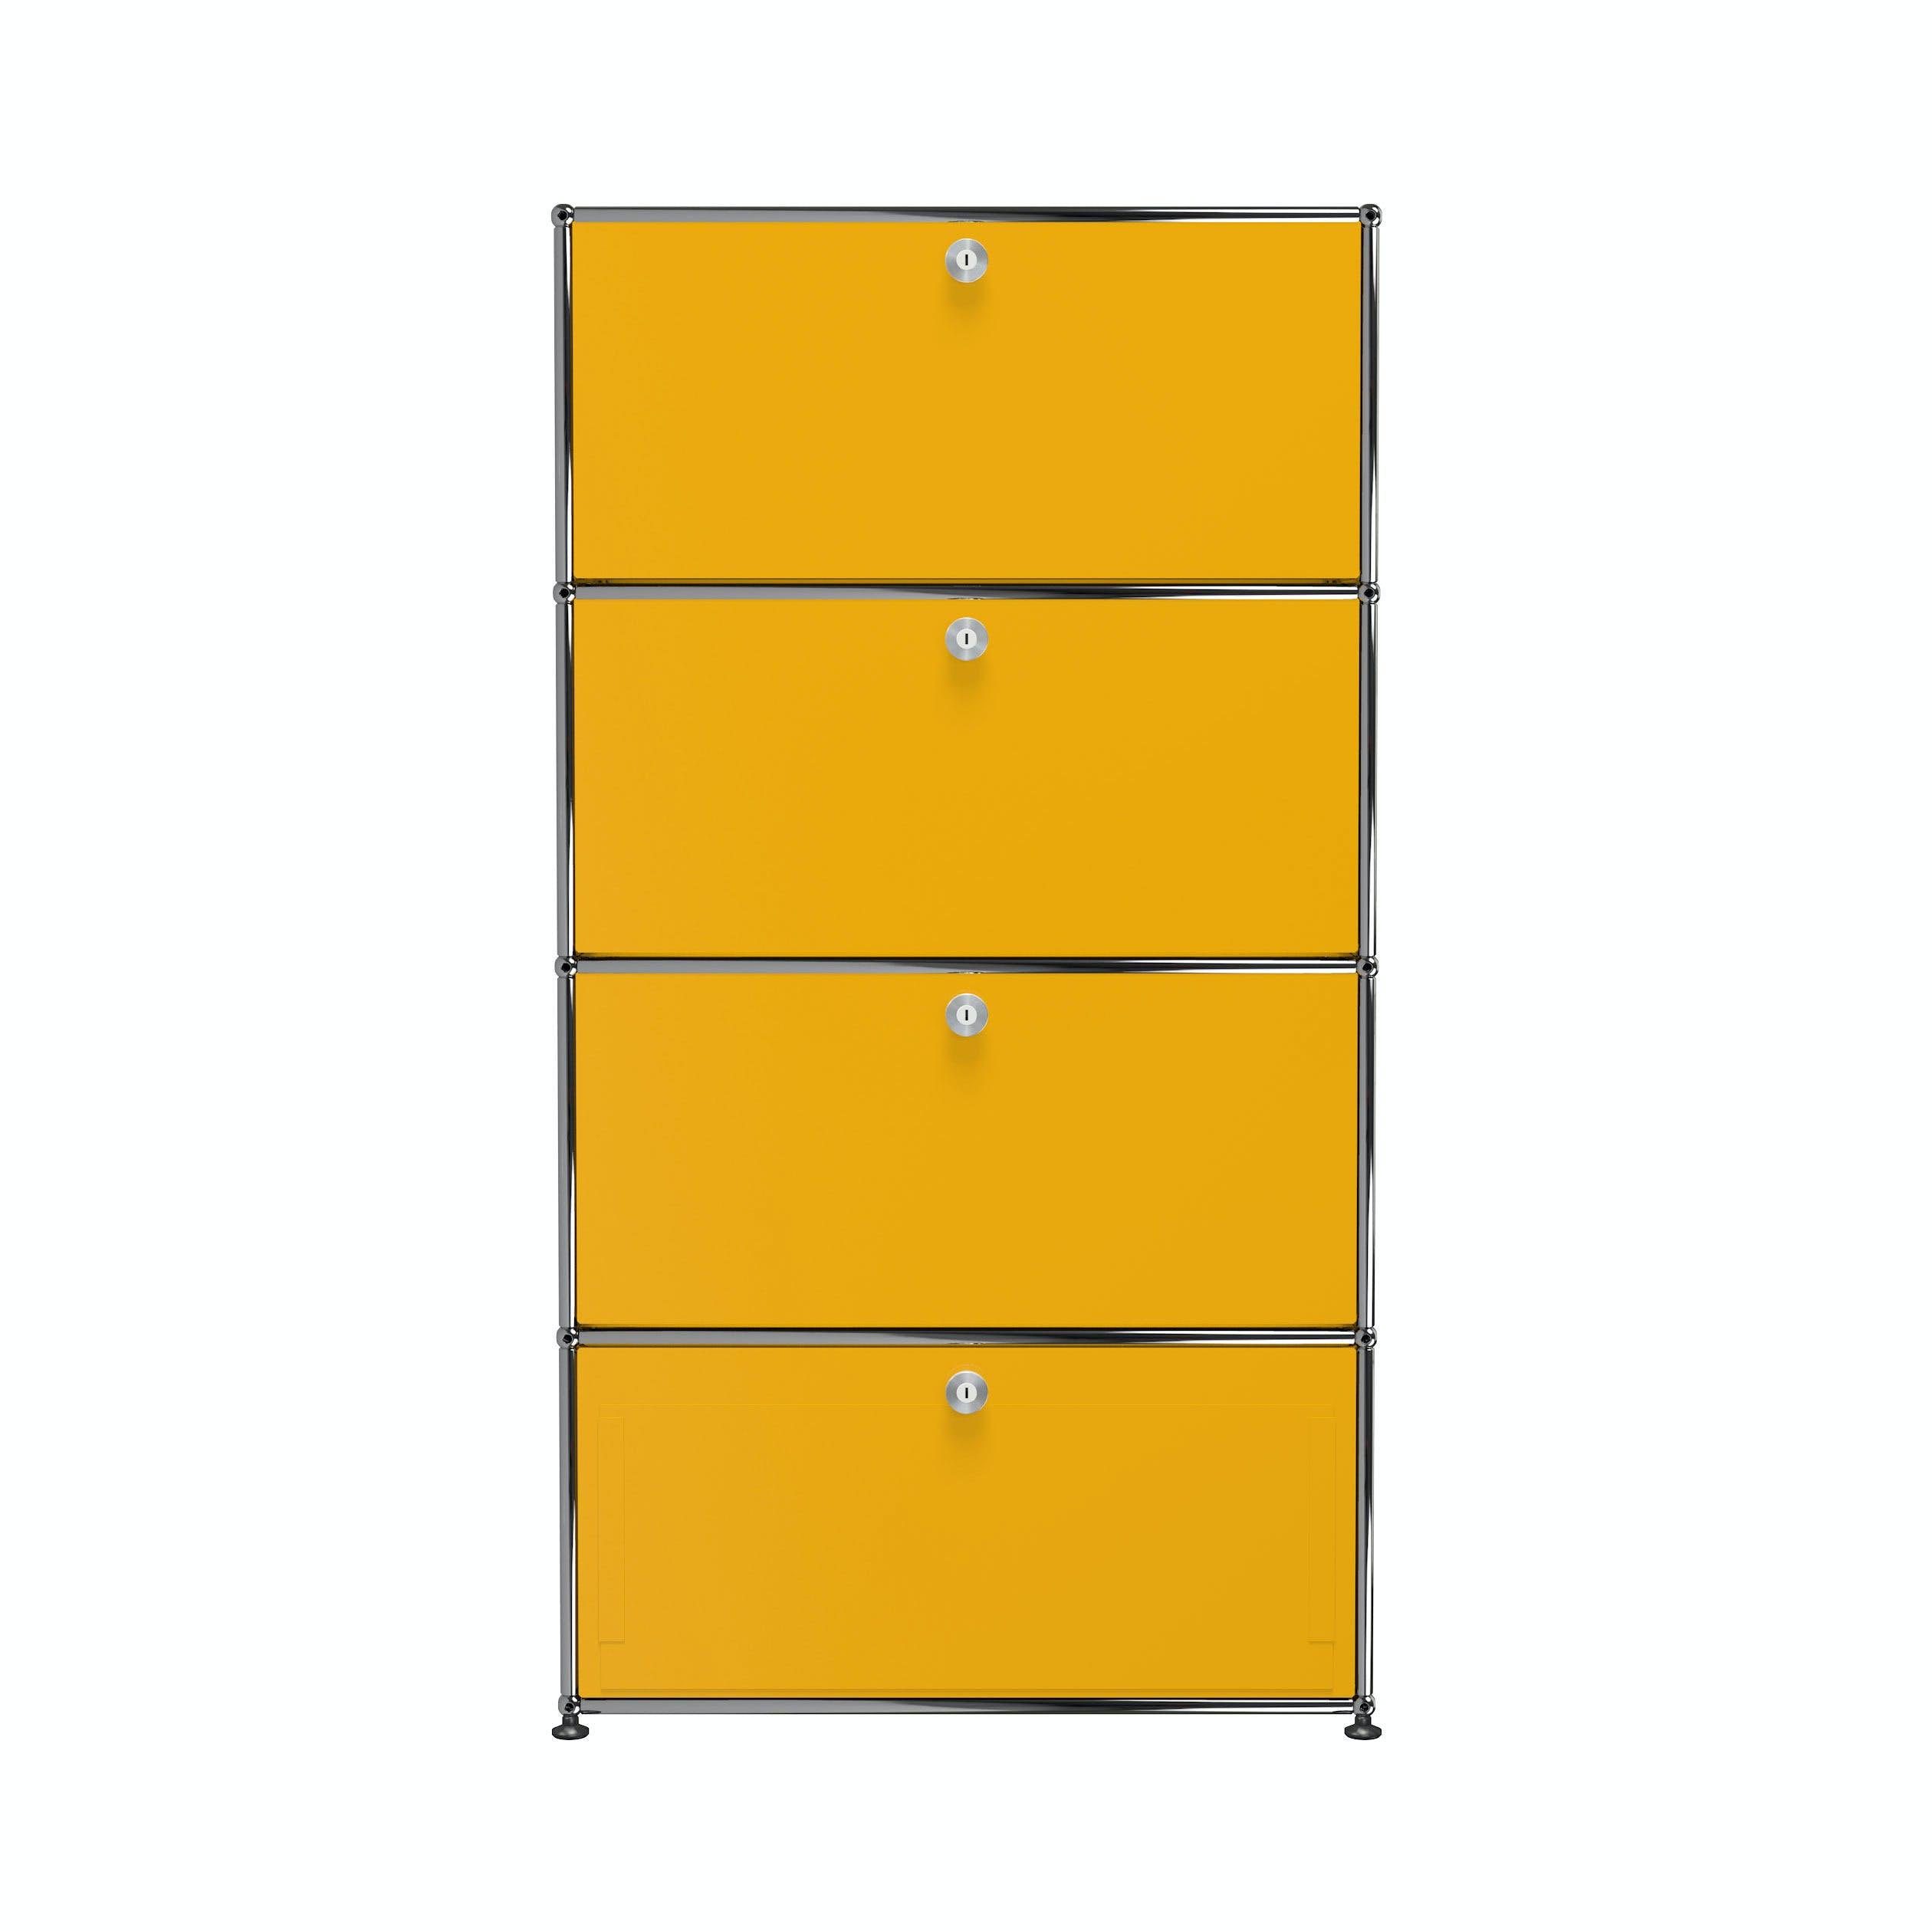 Usm-quick-ship-Haller-Storage-S118A-yellow-haute-living